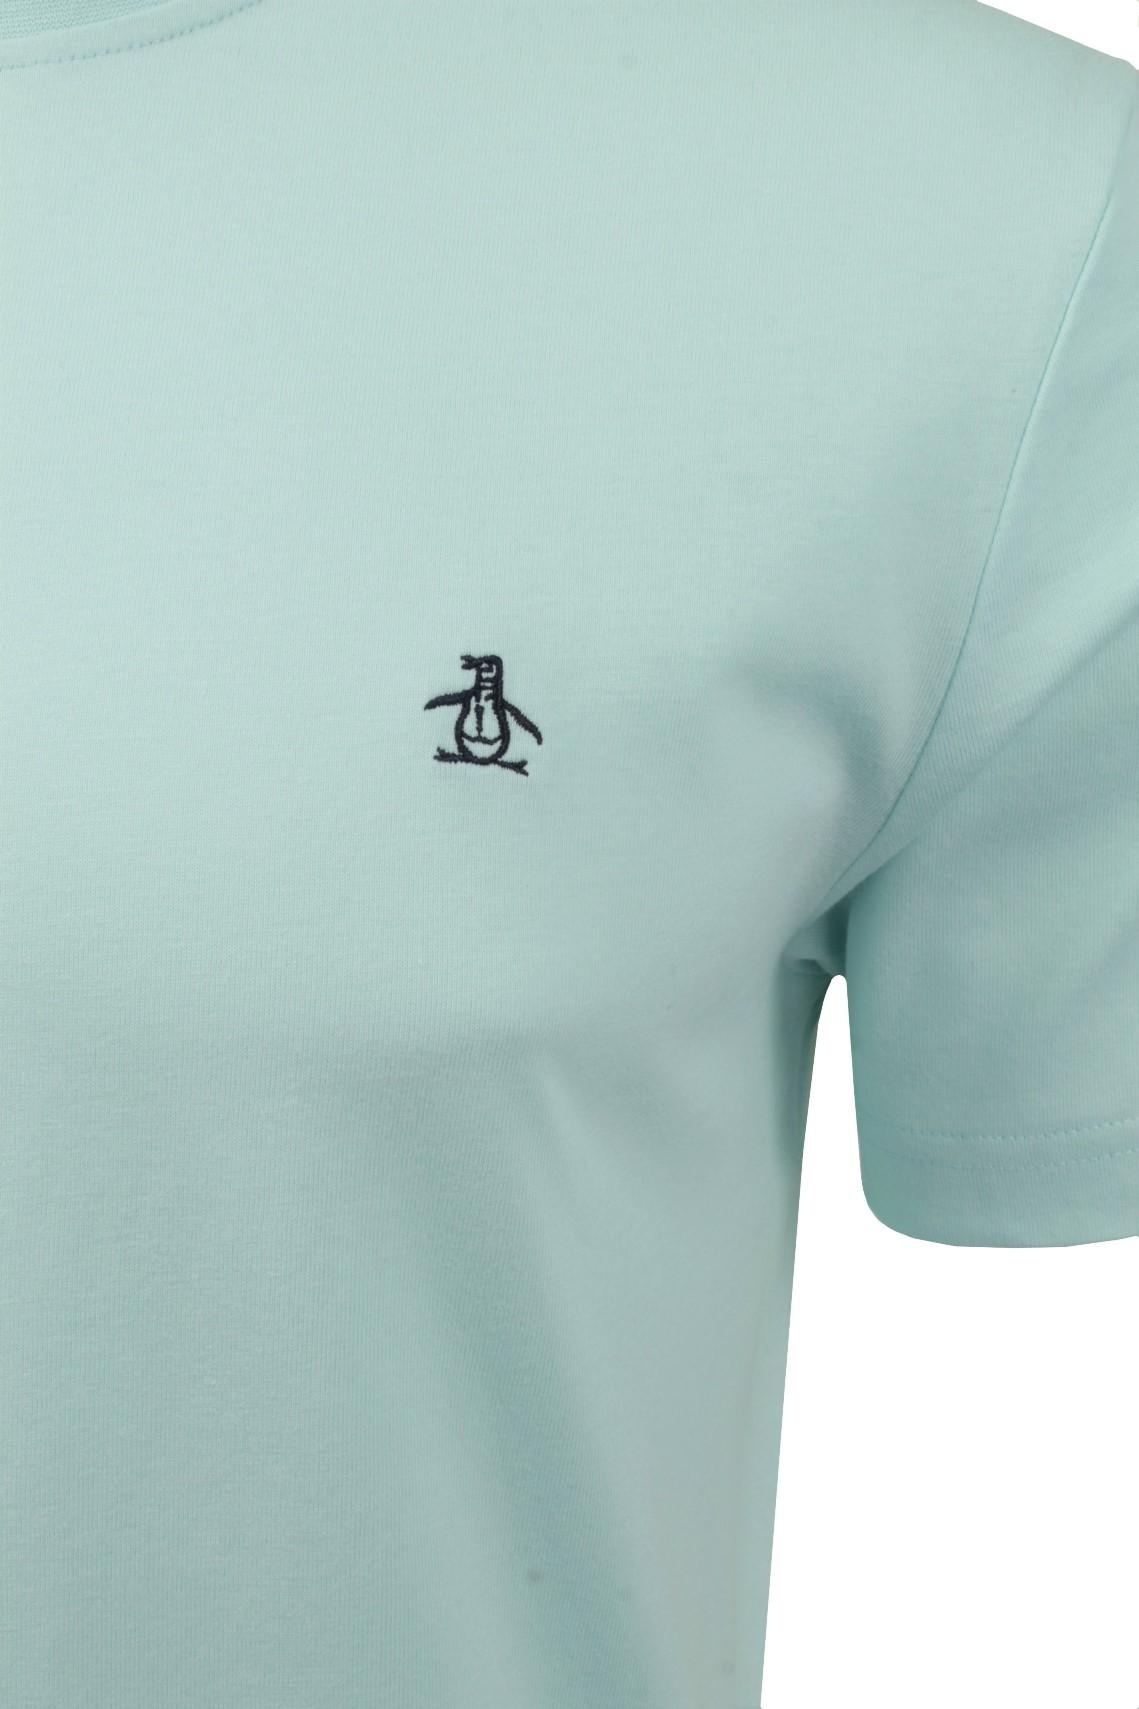 Mens-T-Shirt-by-Original-Penguin-Crew-Neck-Short-Sleeved thumbnail 4